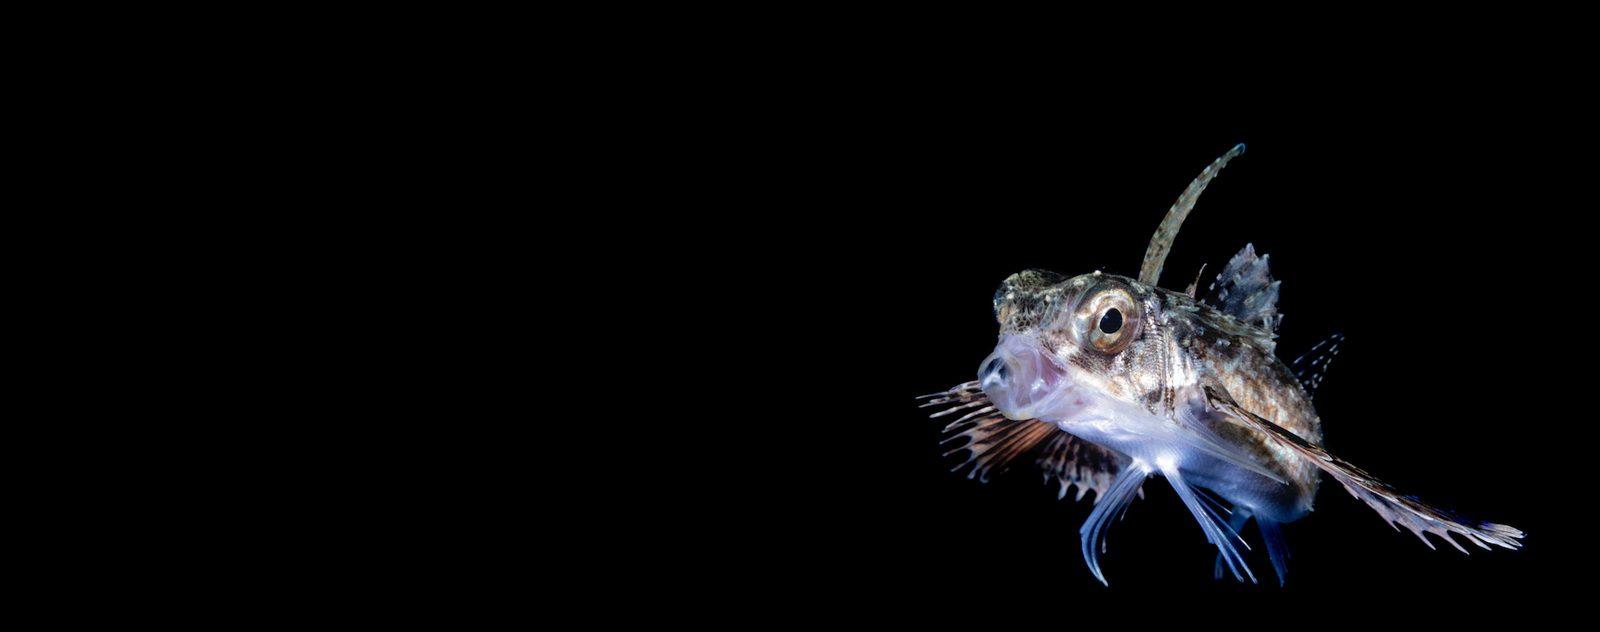 blackwater photography lembeh